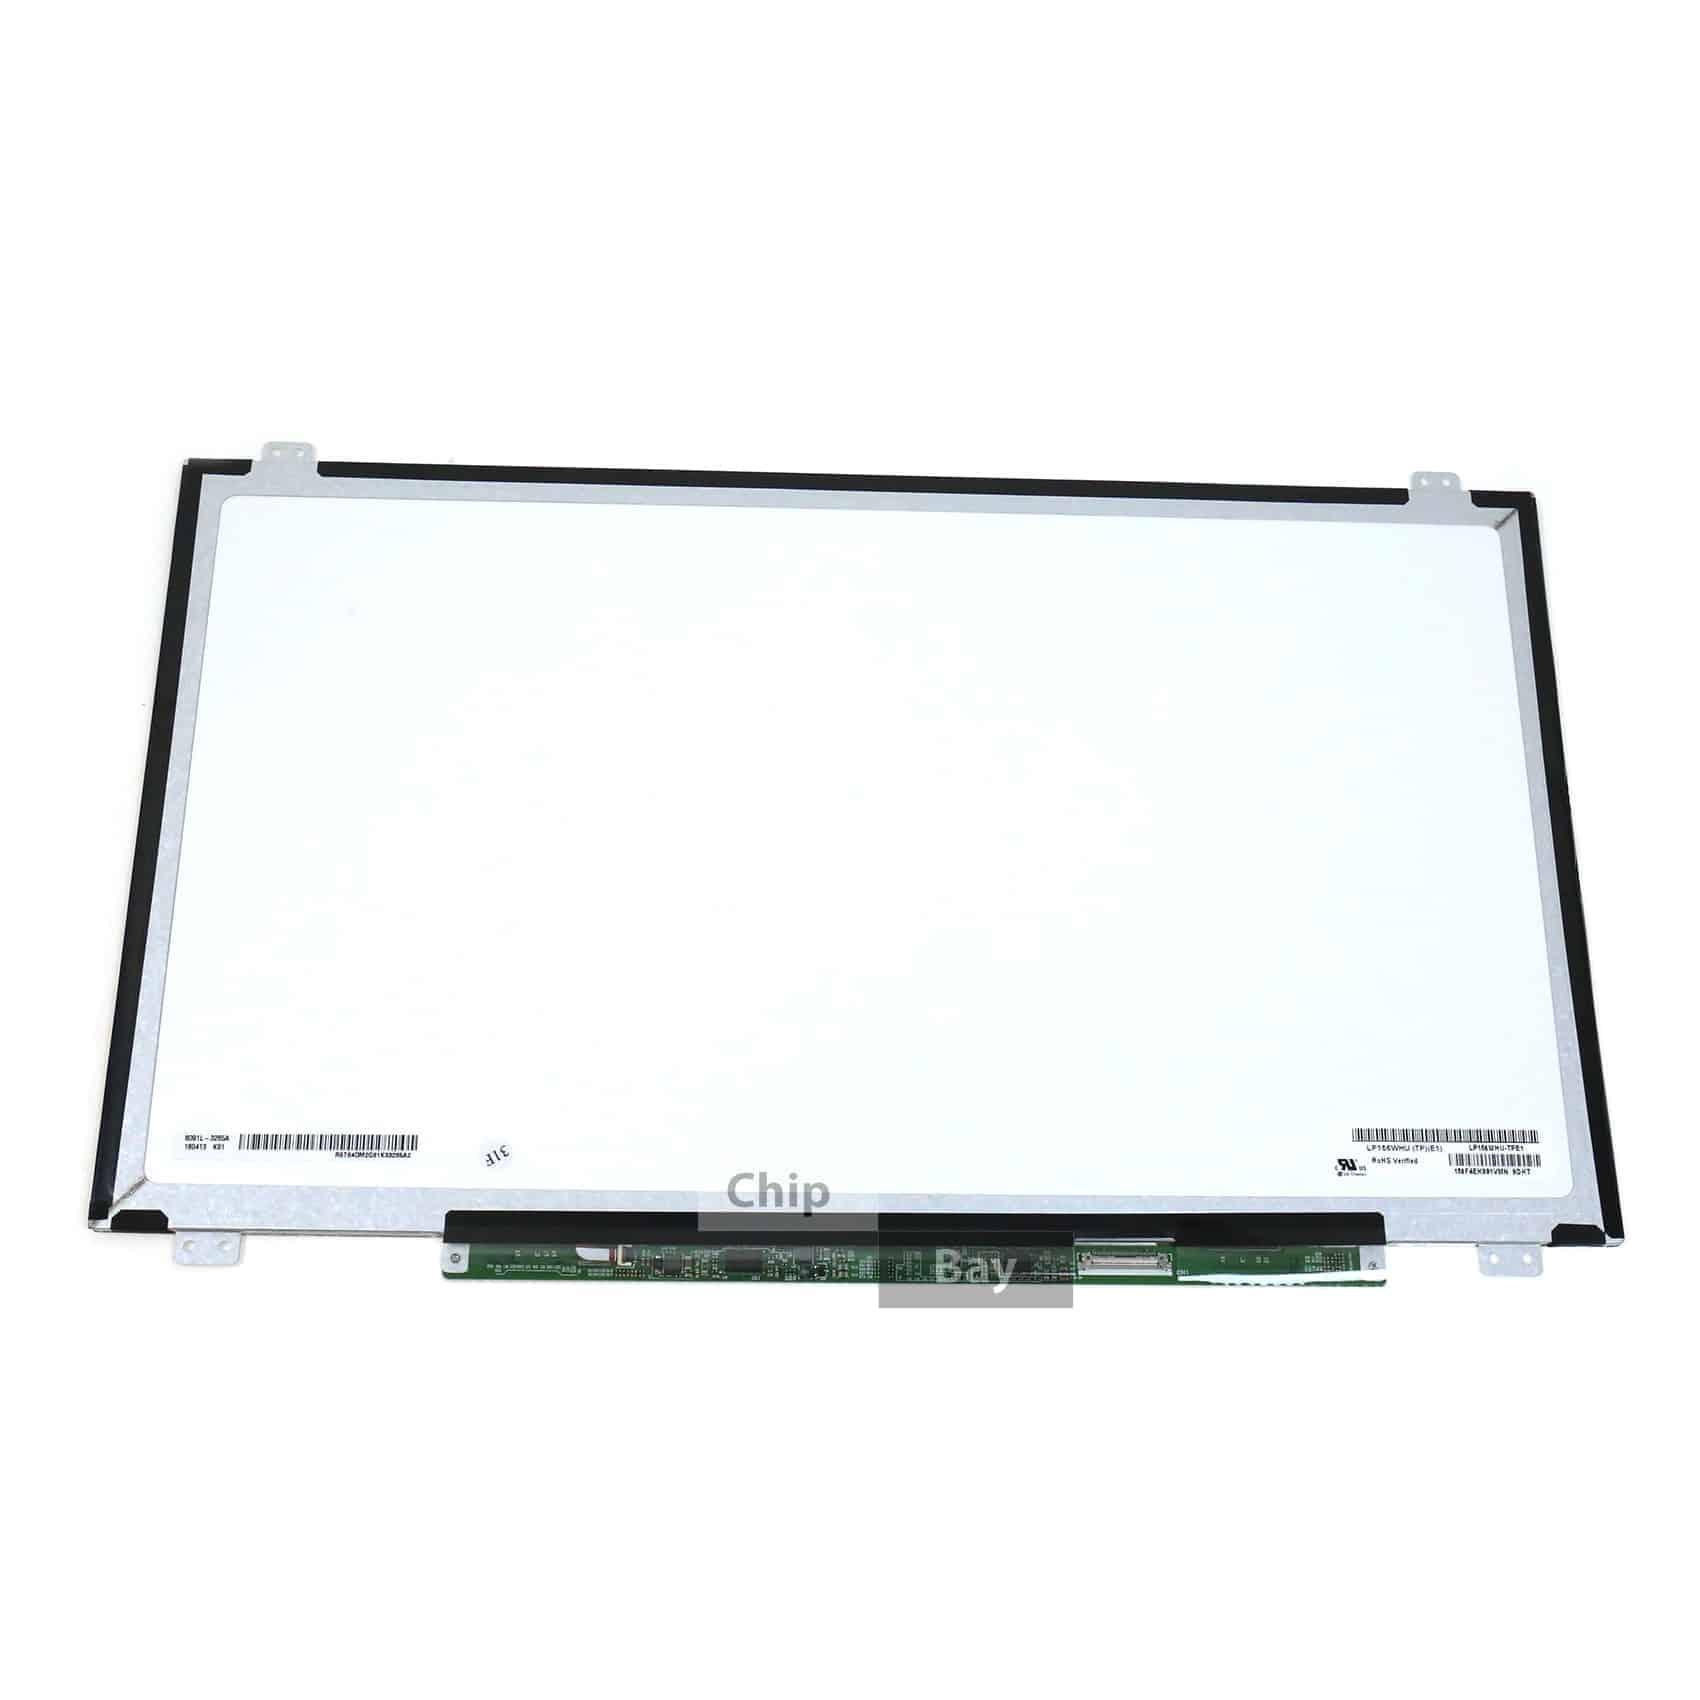 Genuine Lg Display 15 6 Led Slim Screen Lp156whu Tp E1